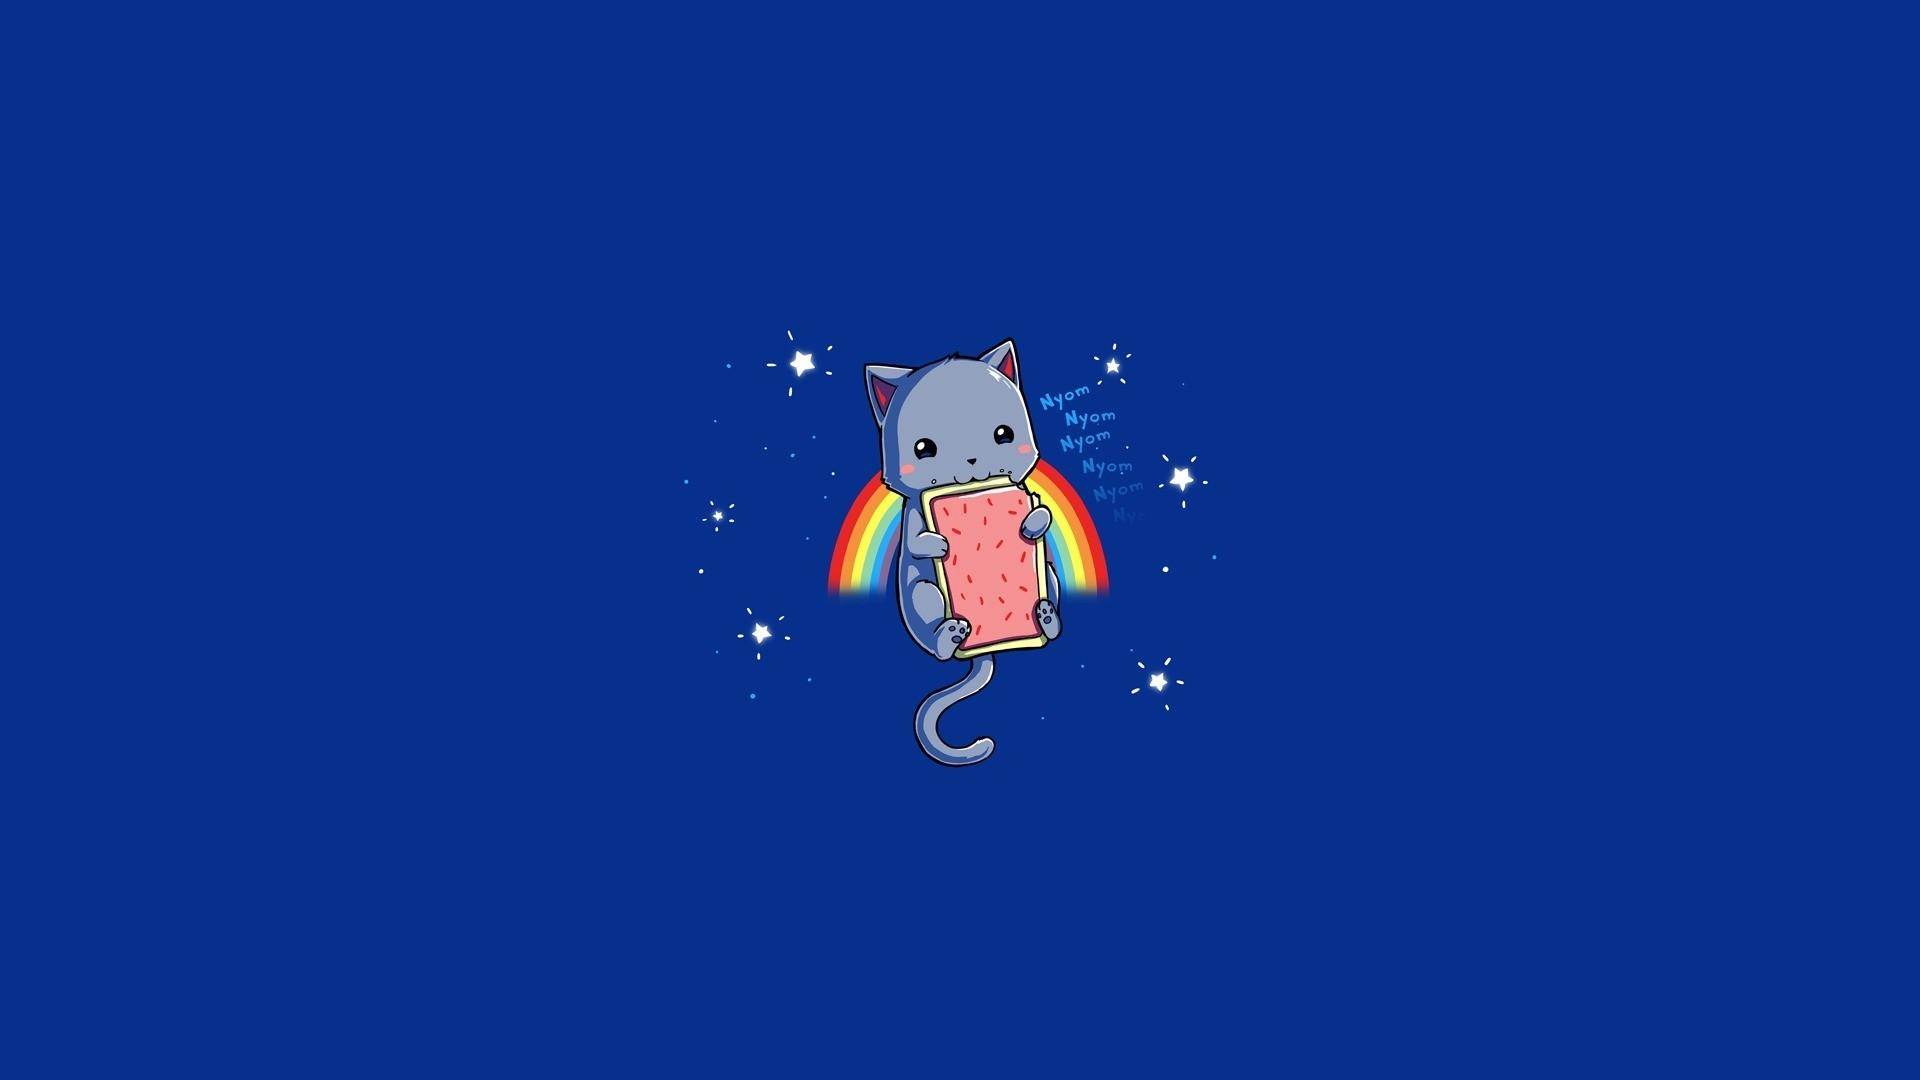 Nyan Cat Hd Wallpaper Background Image 1920x1080 Id